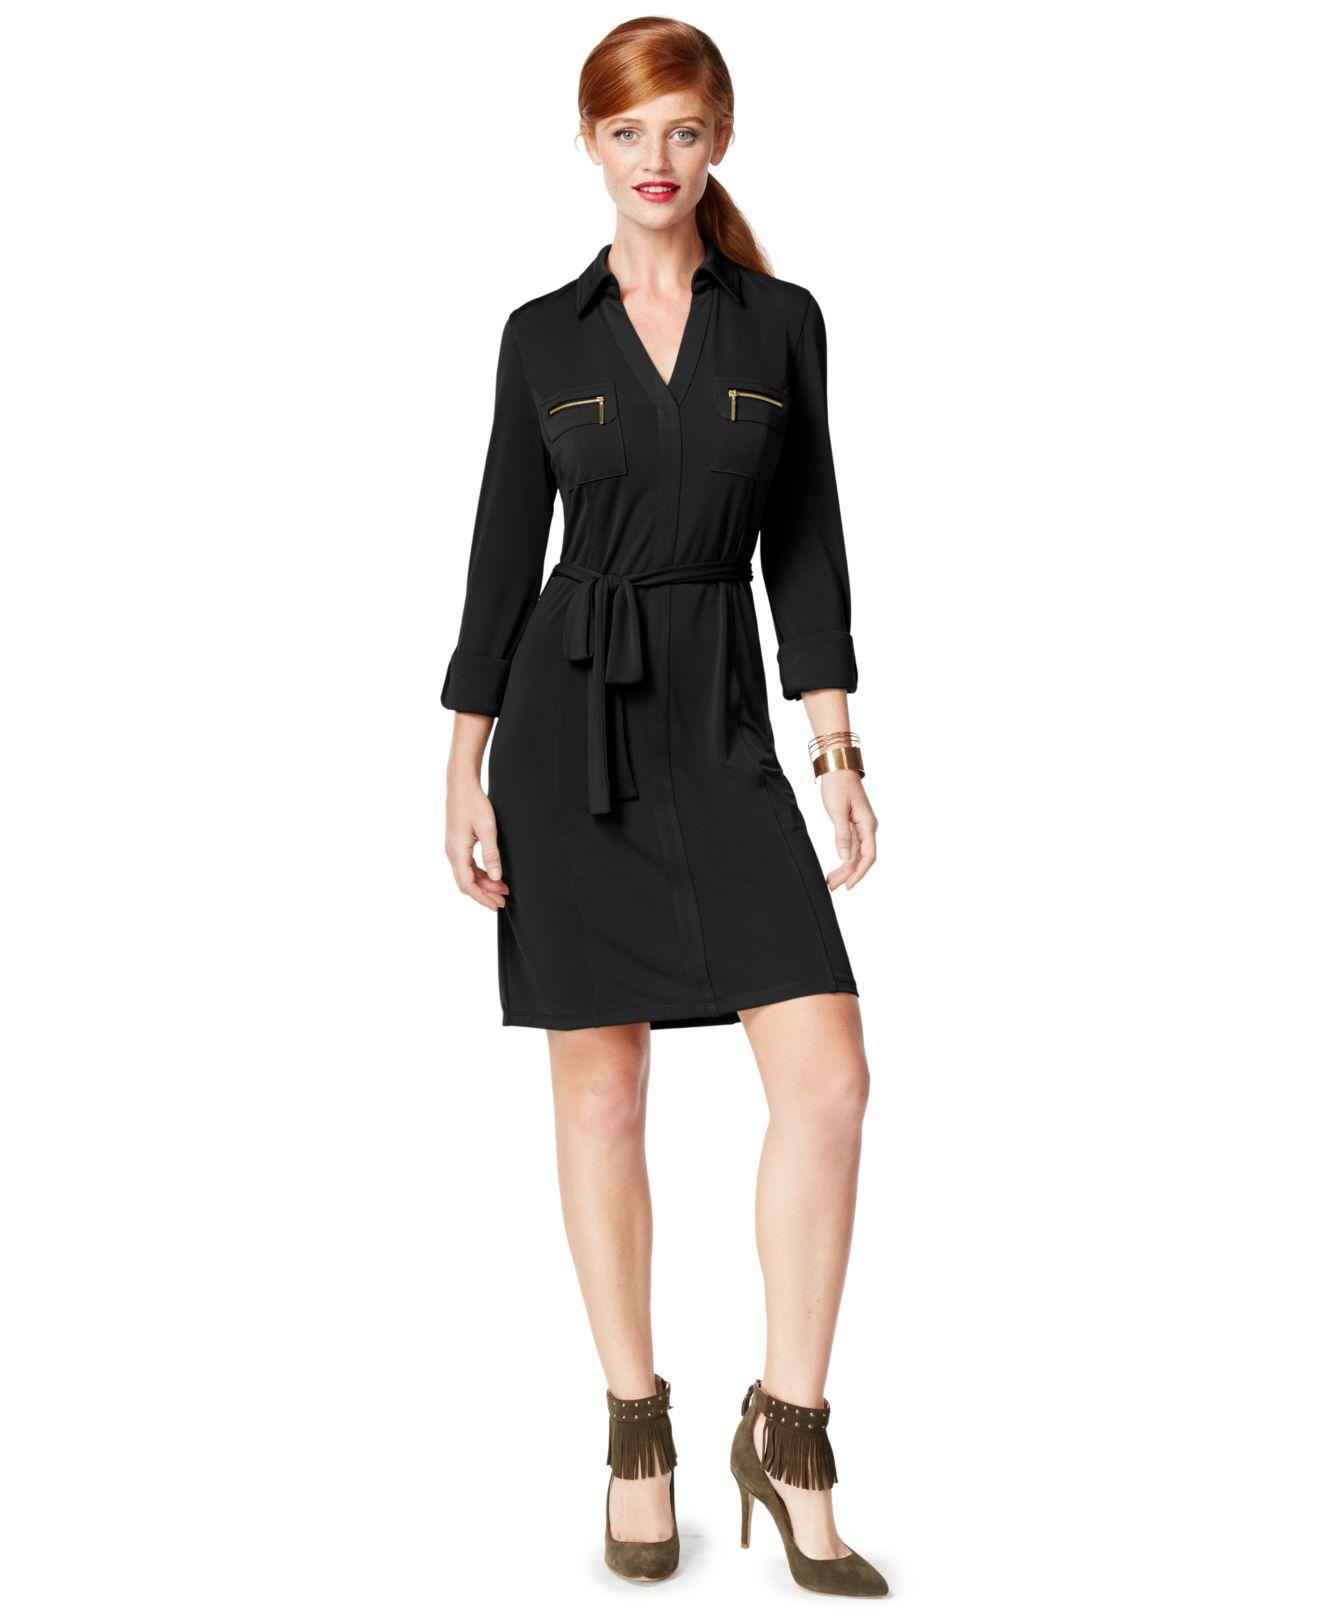 Macy's online women's clothing